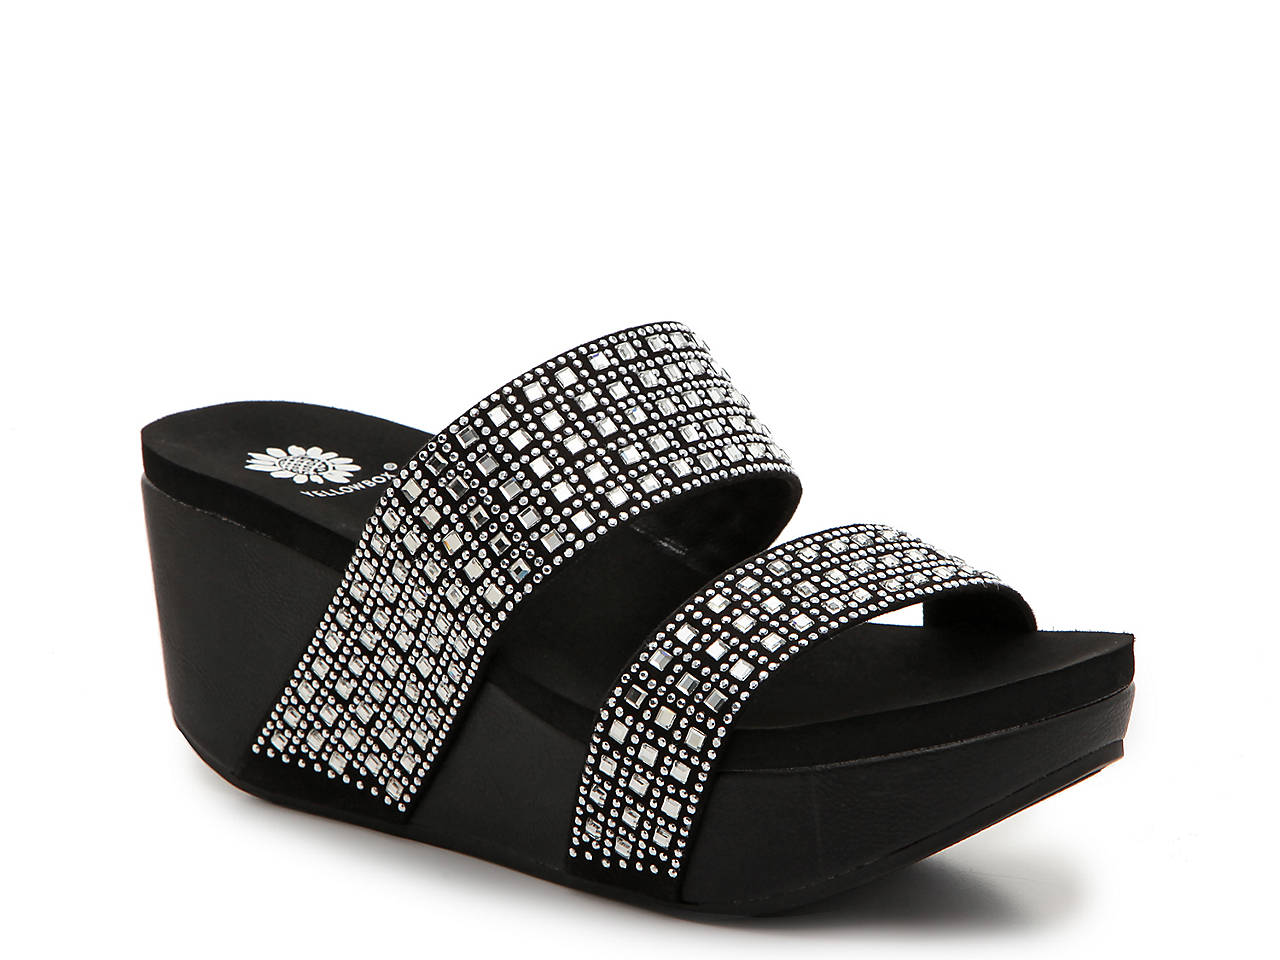 94cddb822a Yellow Box Valara Wedge Sandal Women s Shoes